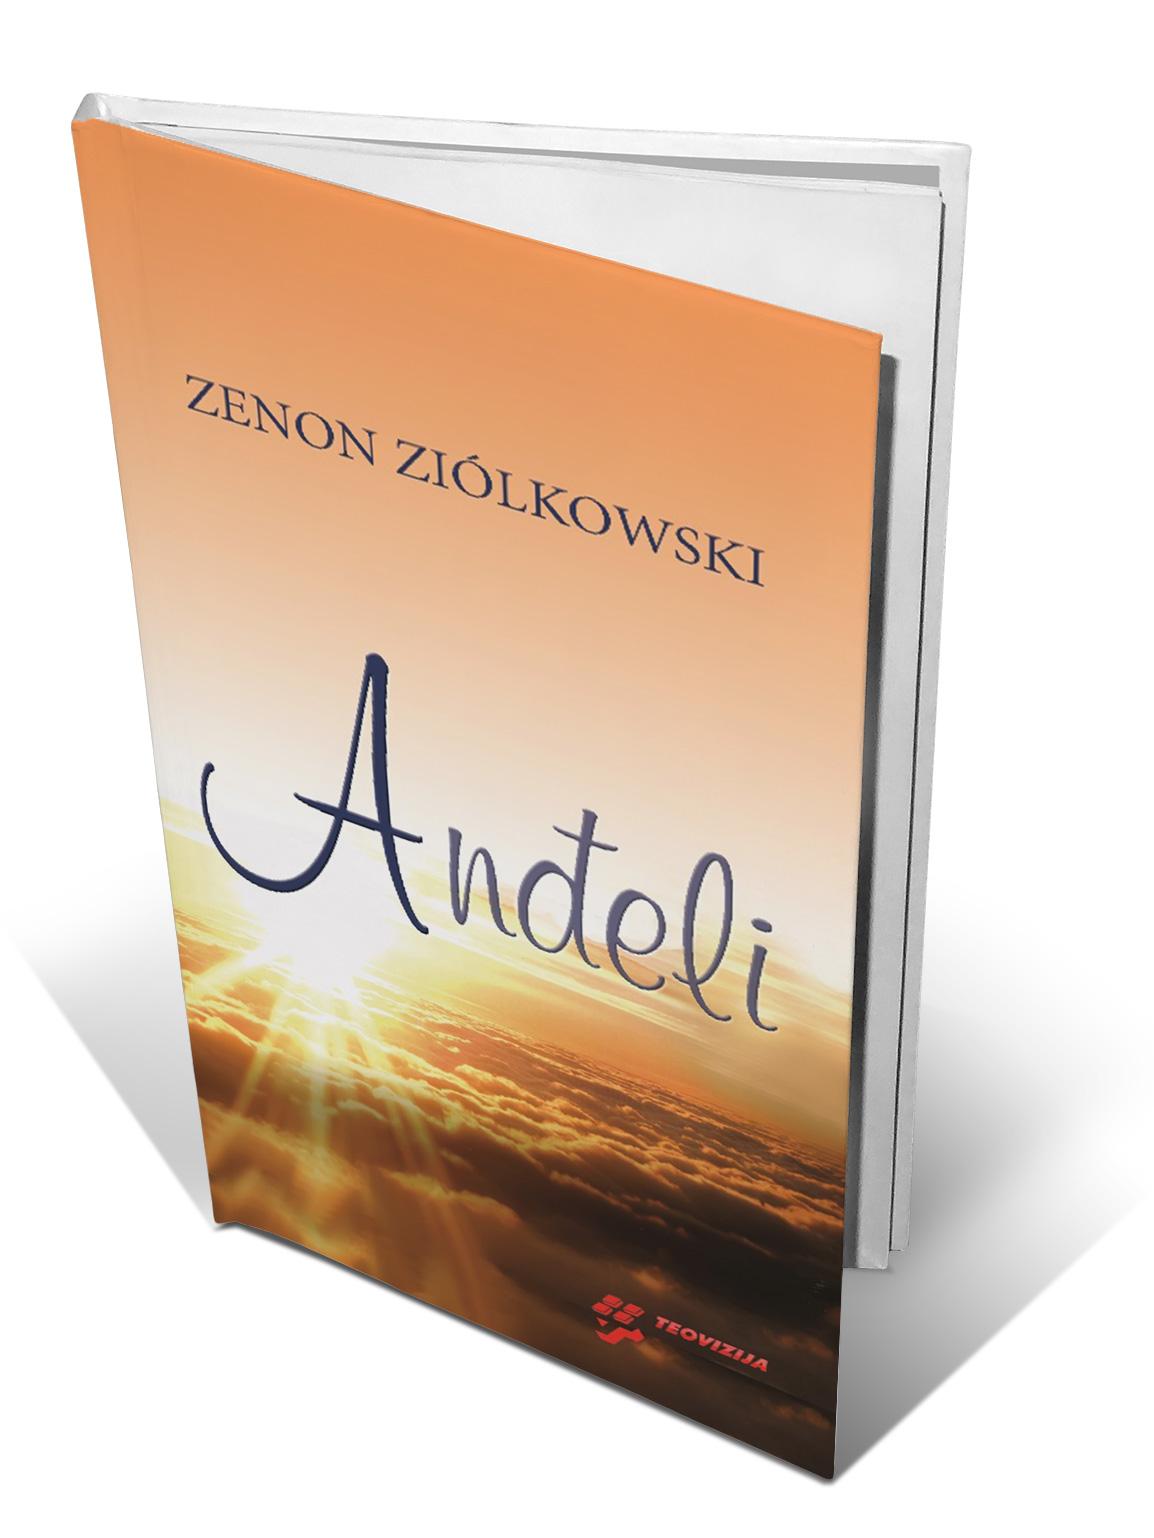 ANĐELI - Zenon Ziółkowski